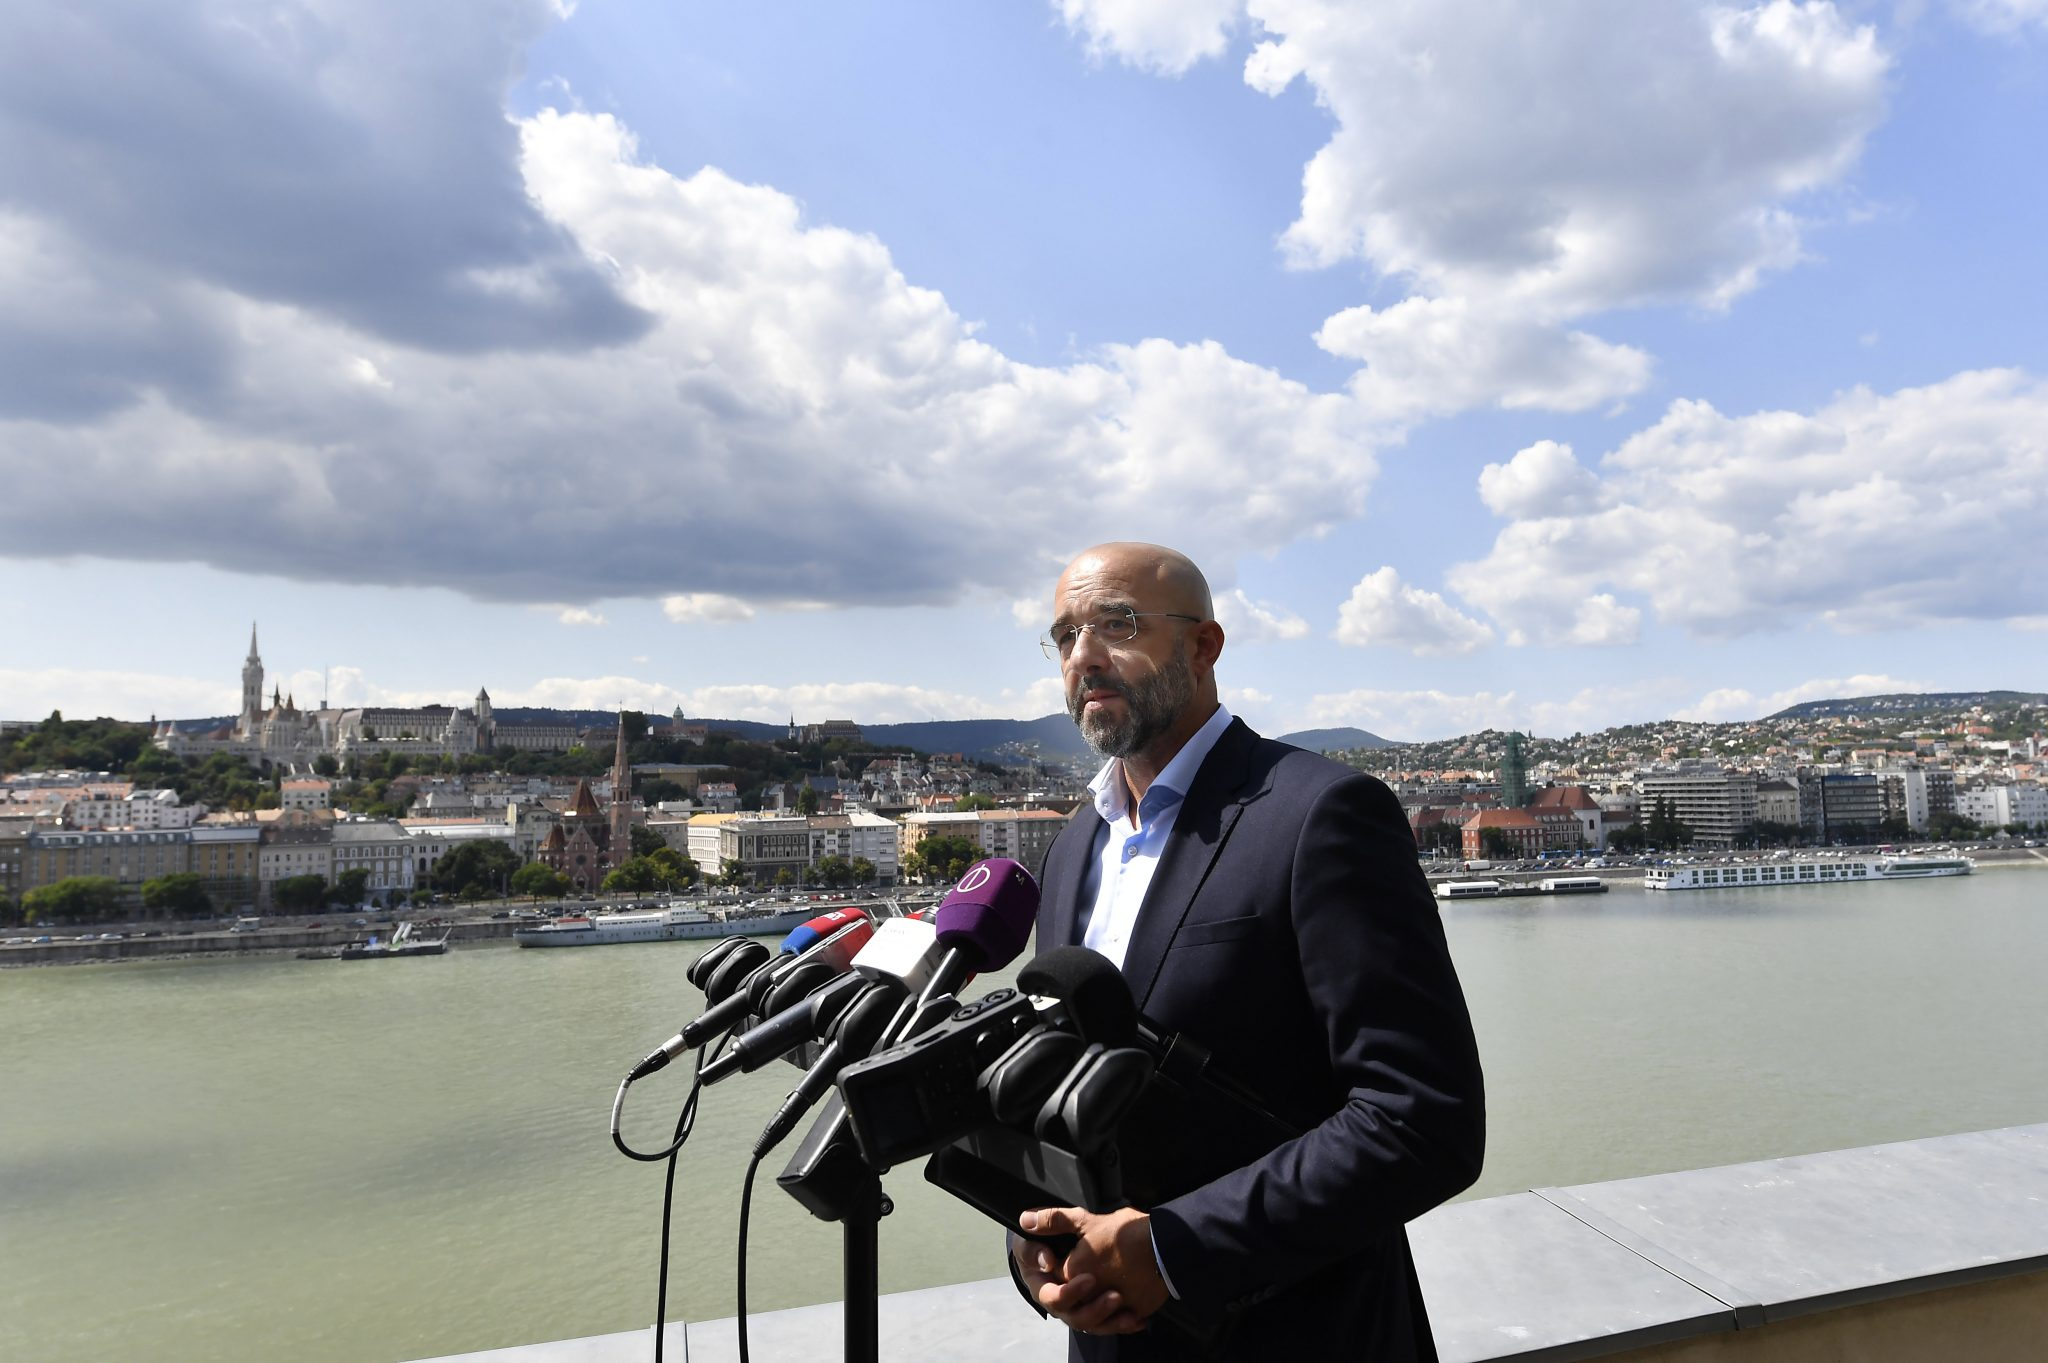 Gov't Spox: Hungary 'Not the Cause' of EU Budget Veto